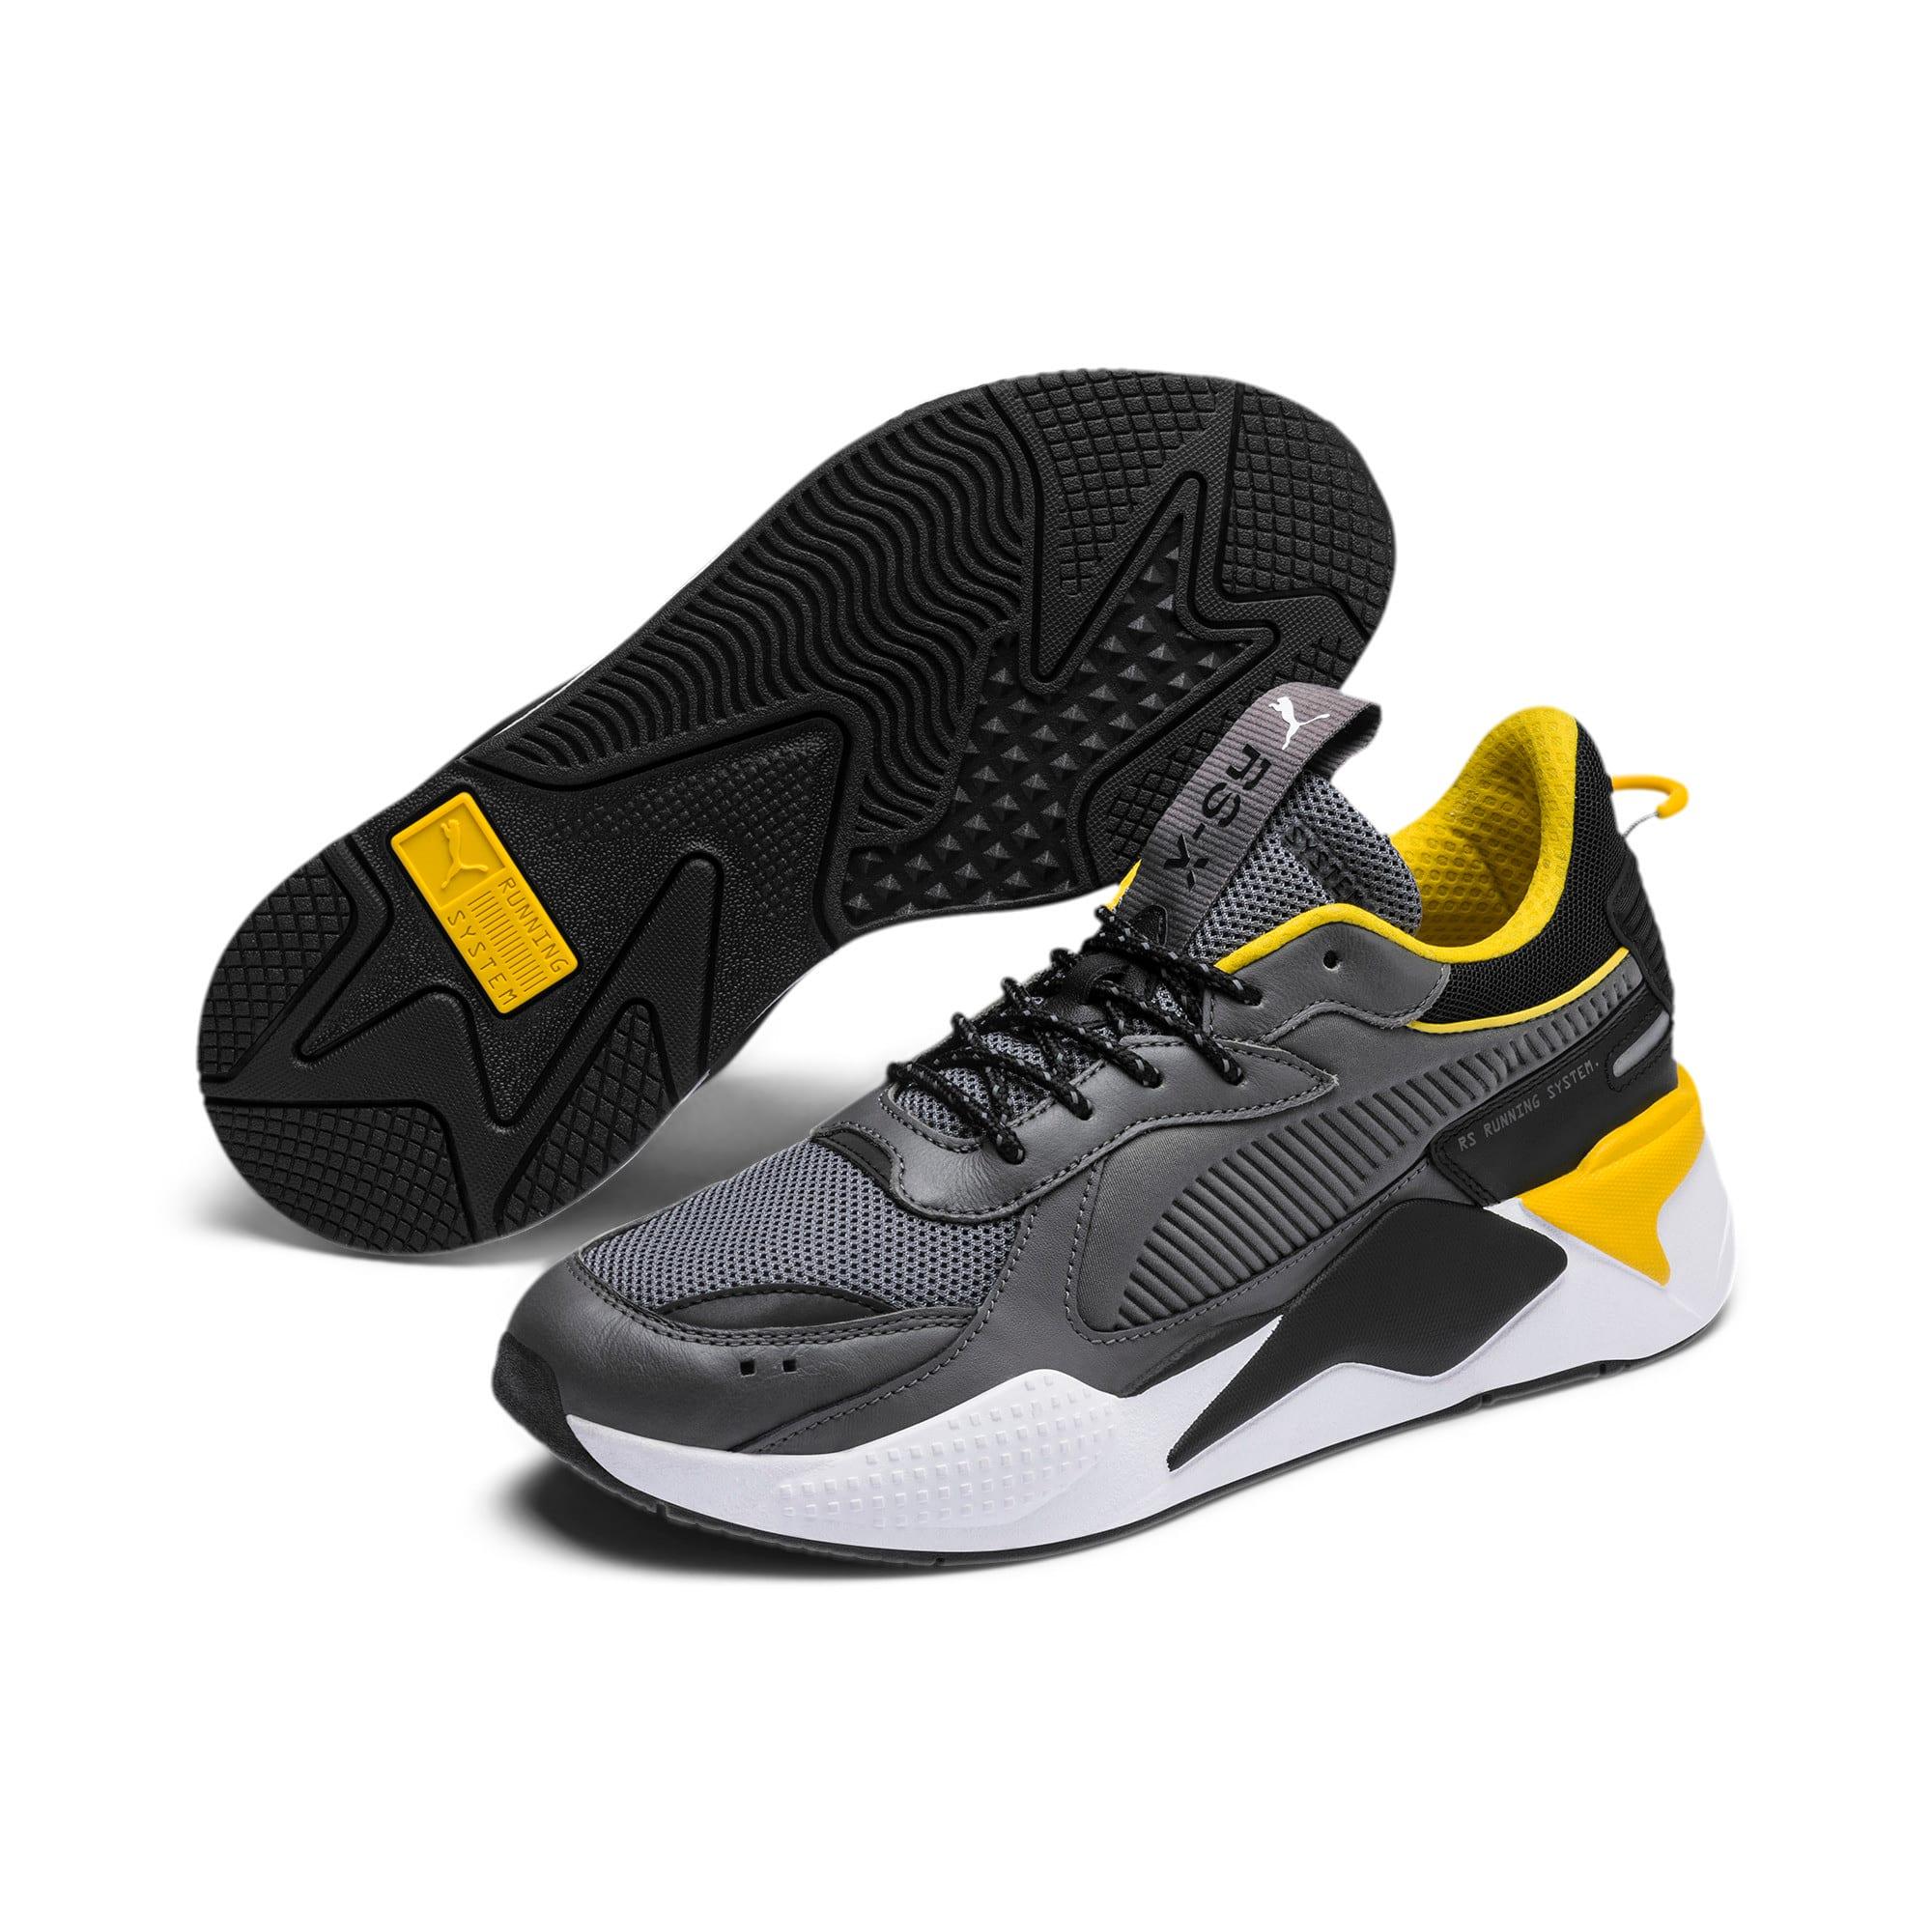 Thumbnail 3 of RS-X Sneaker, CASTLEROCK-Puma Black, medium